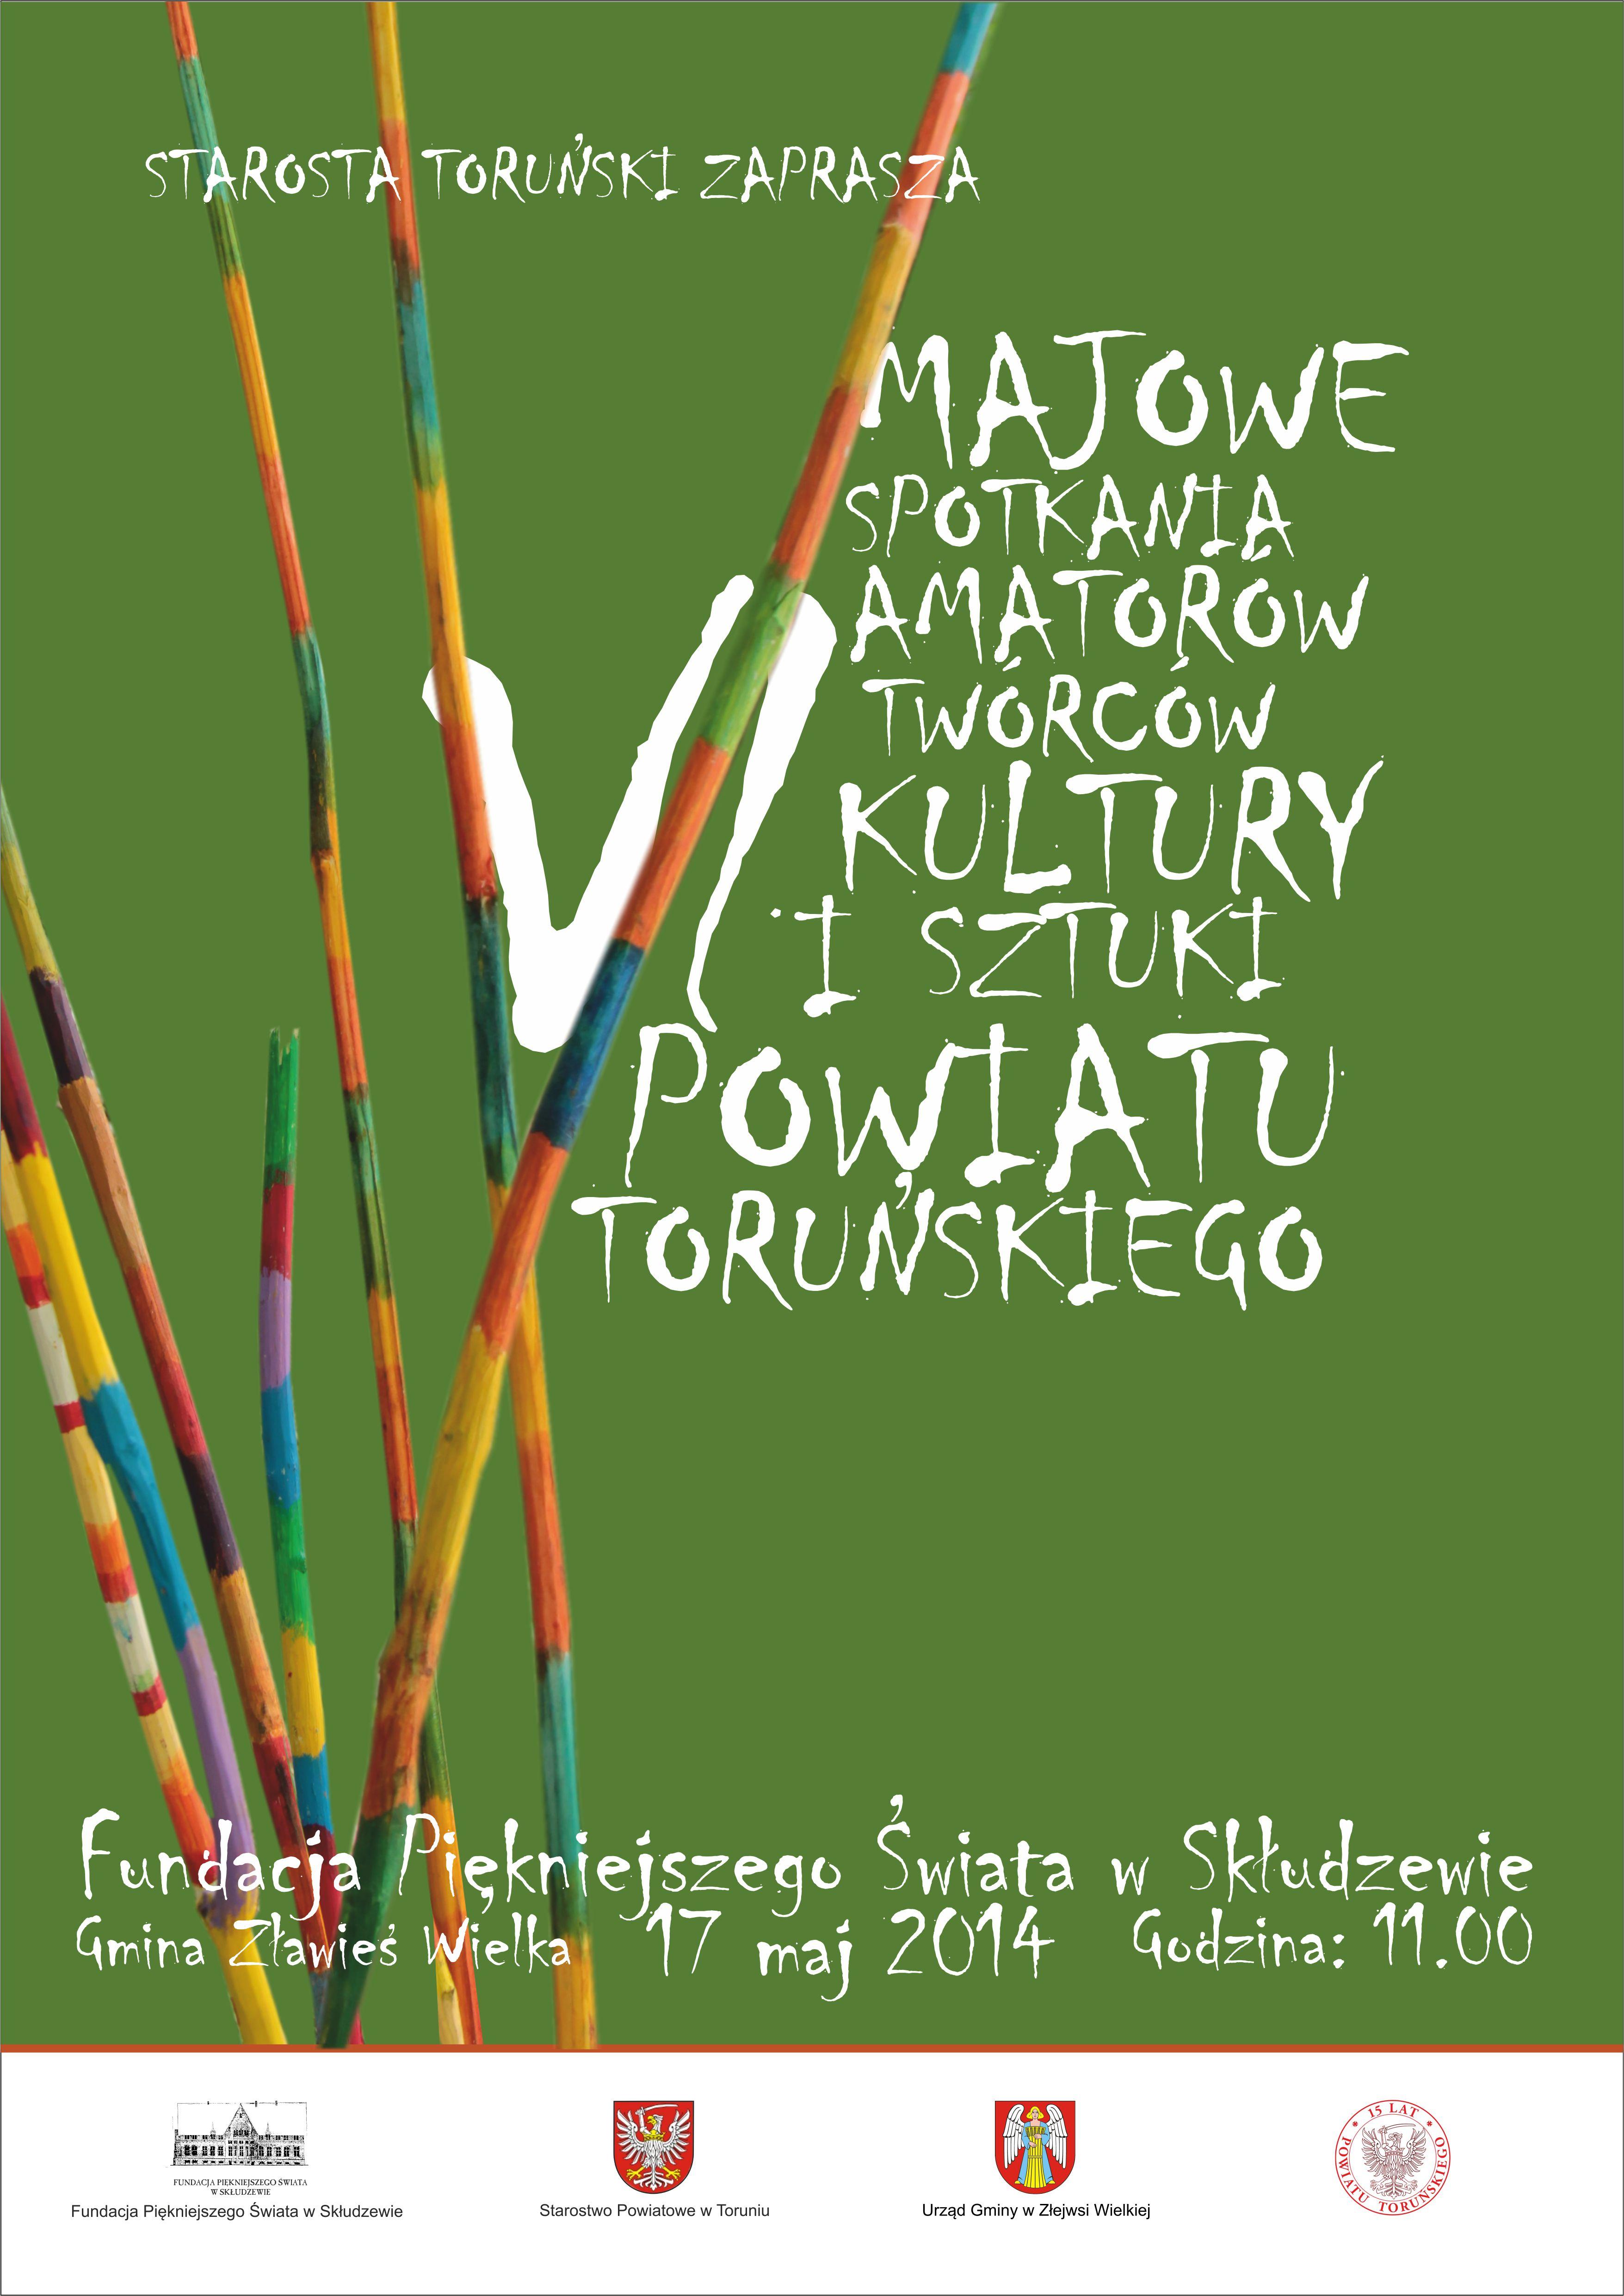 plakat spotkania amatorów v2